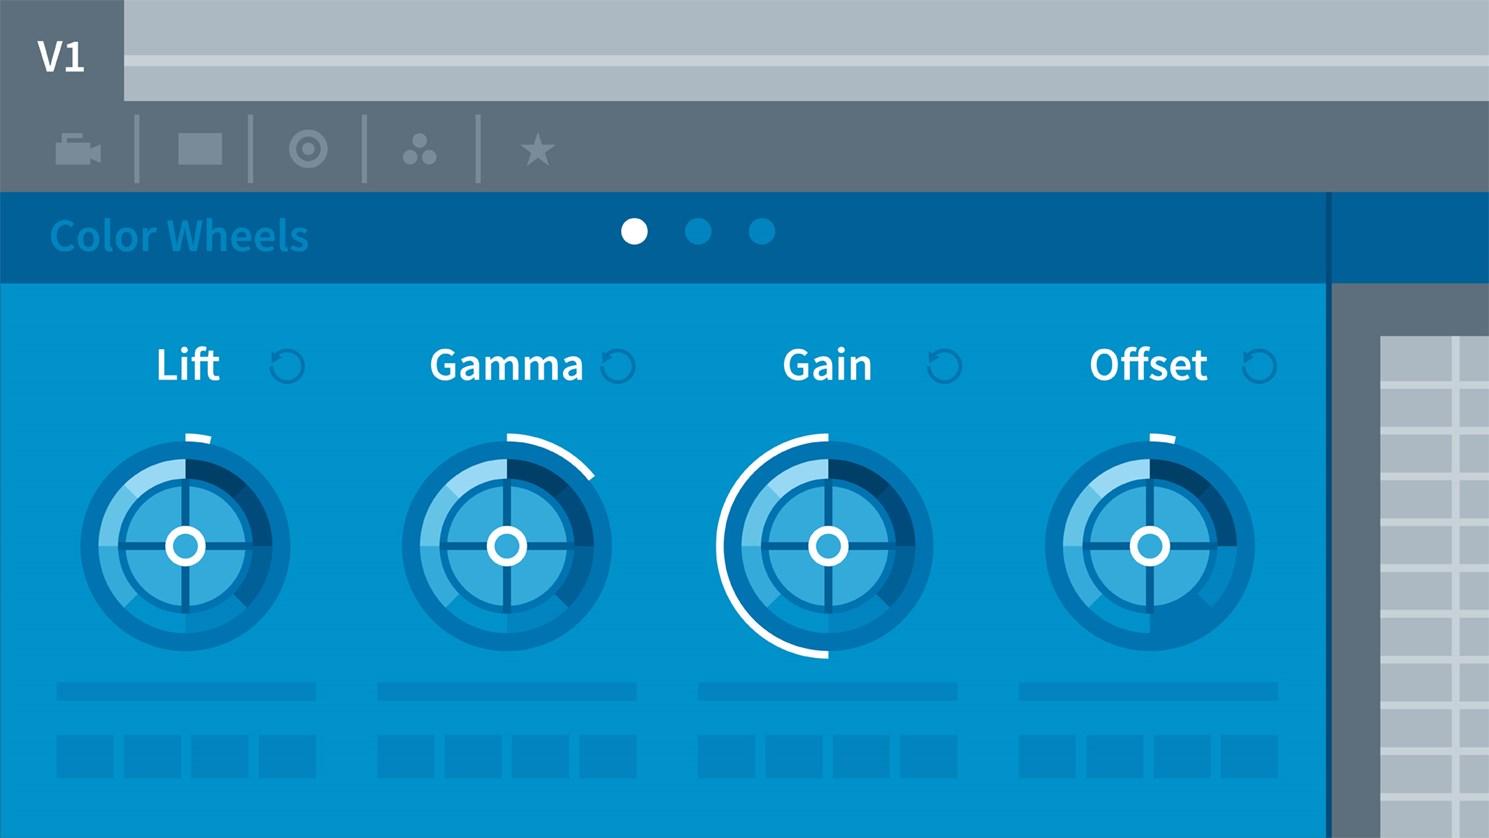 DaVinci Resolve Guru: Hardware for Color Correction